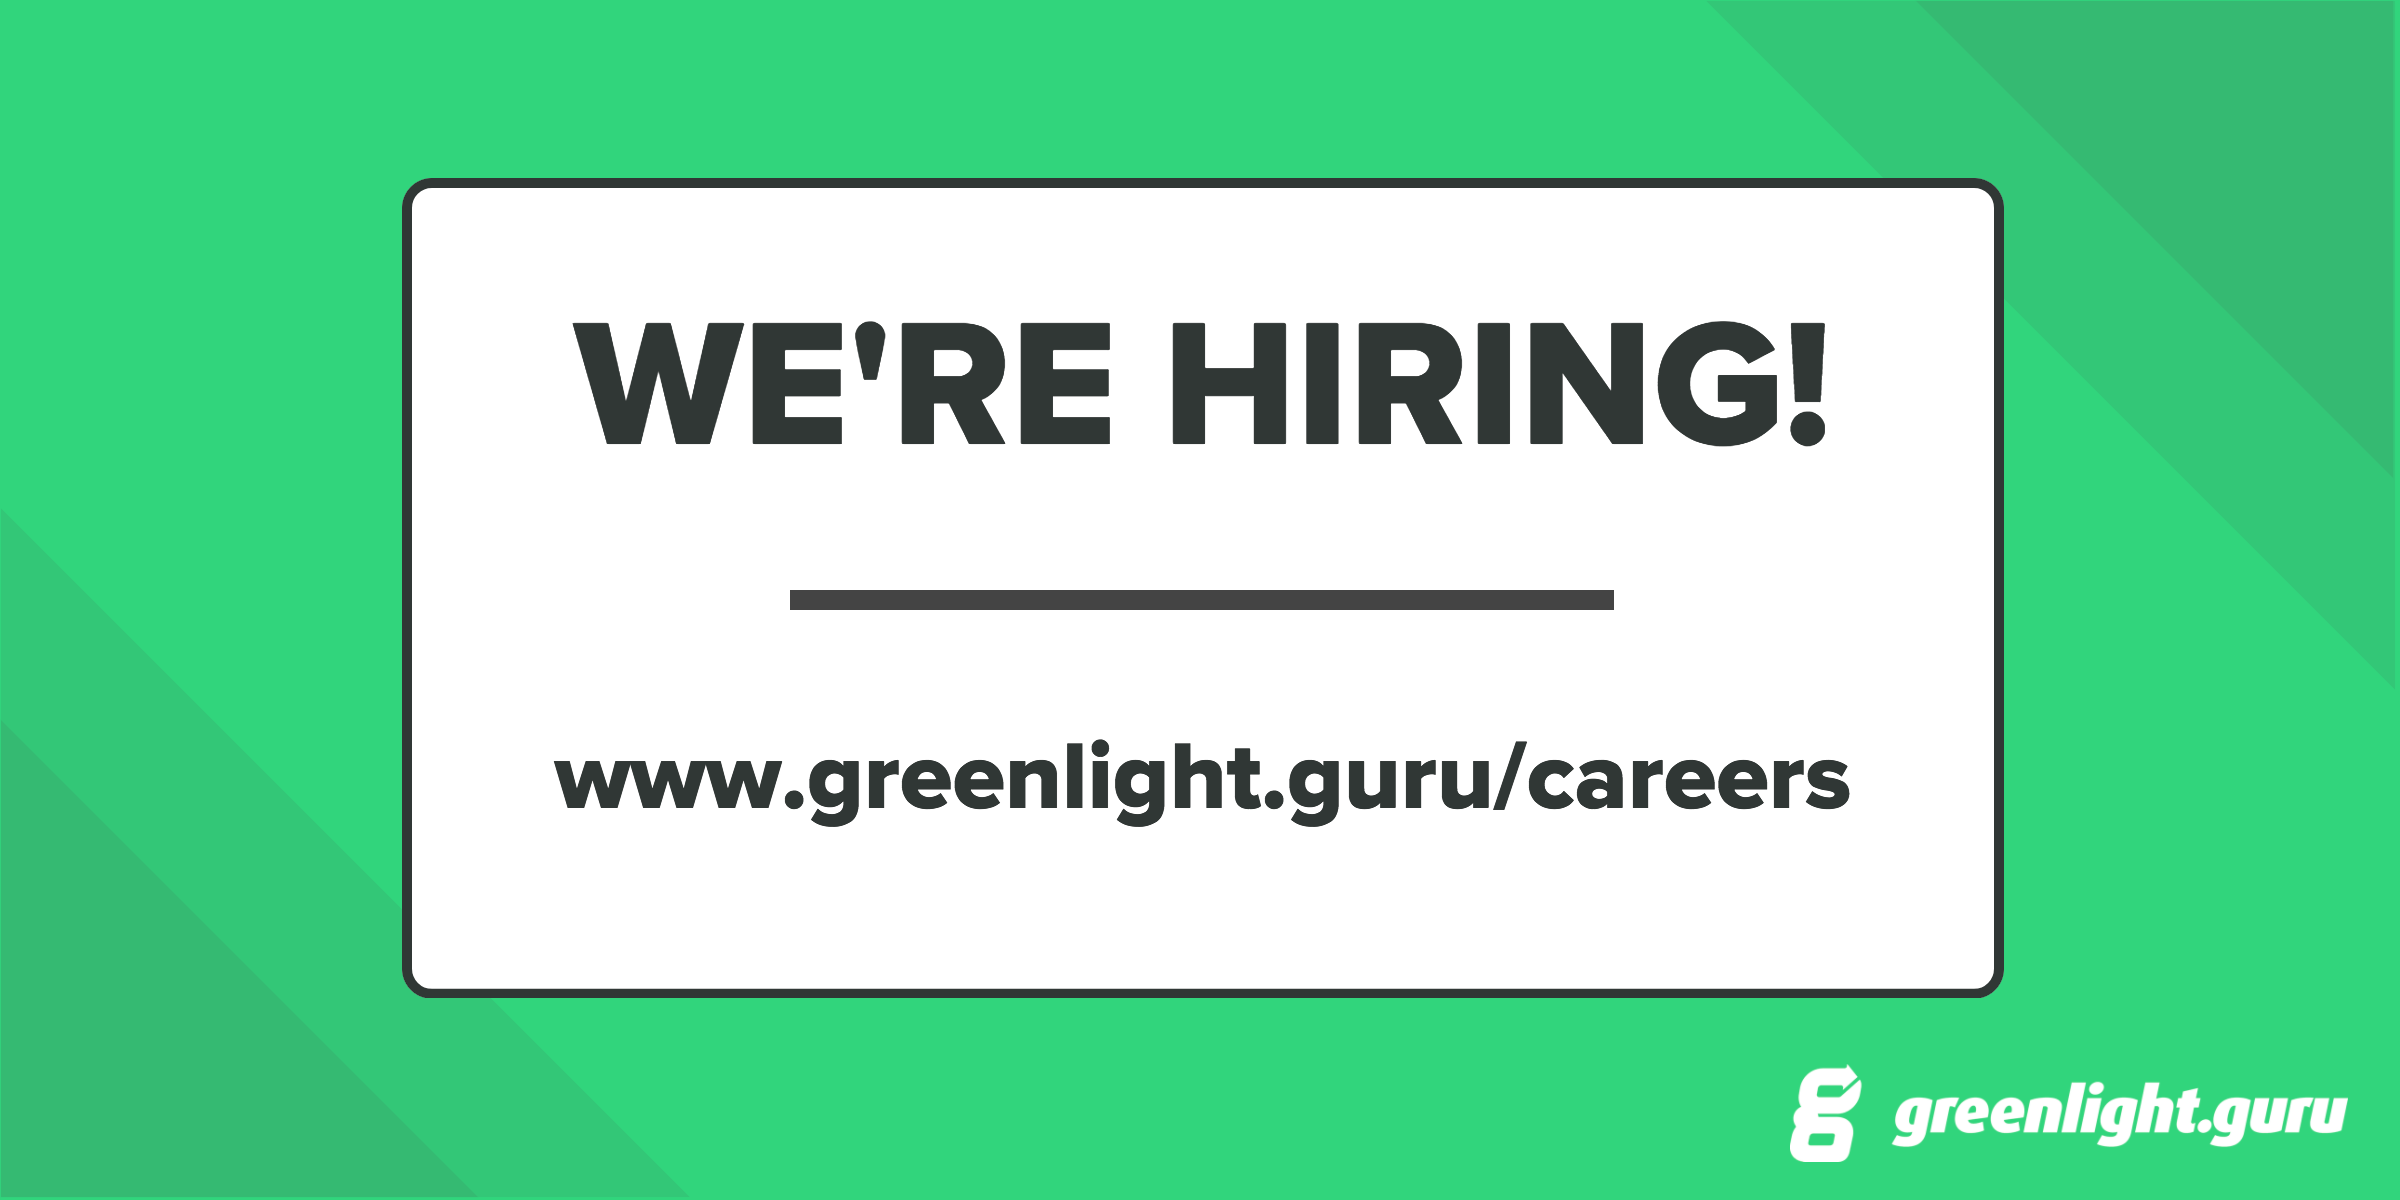 Greenlight-Guru-Hiring.png